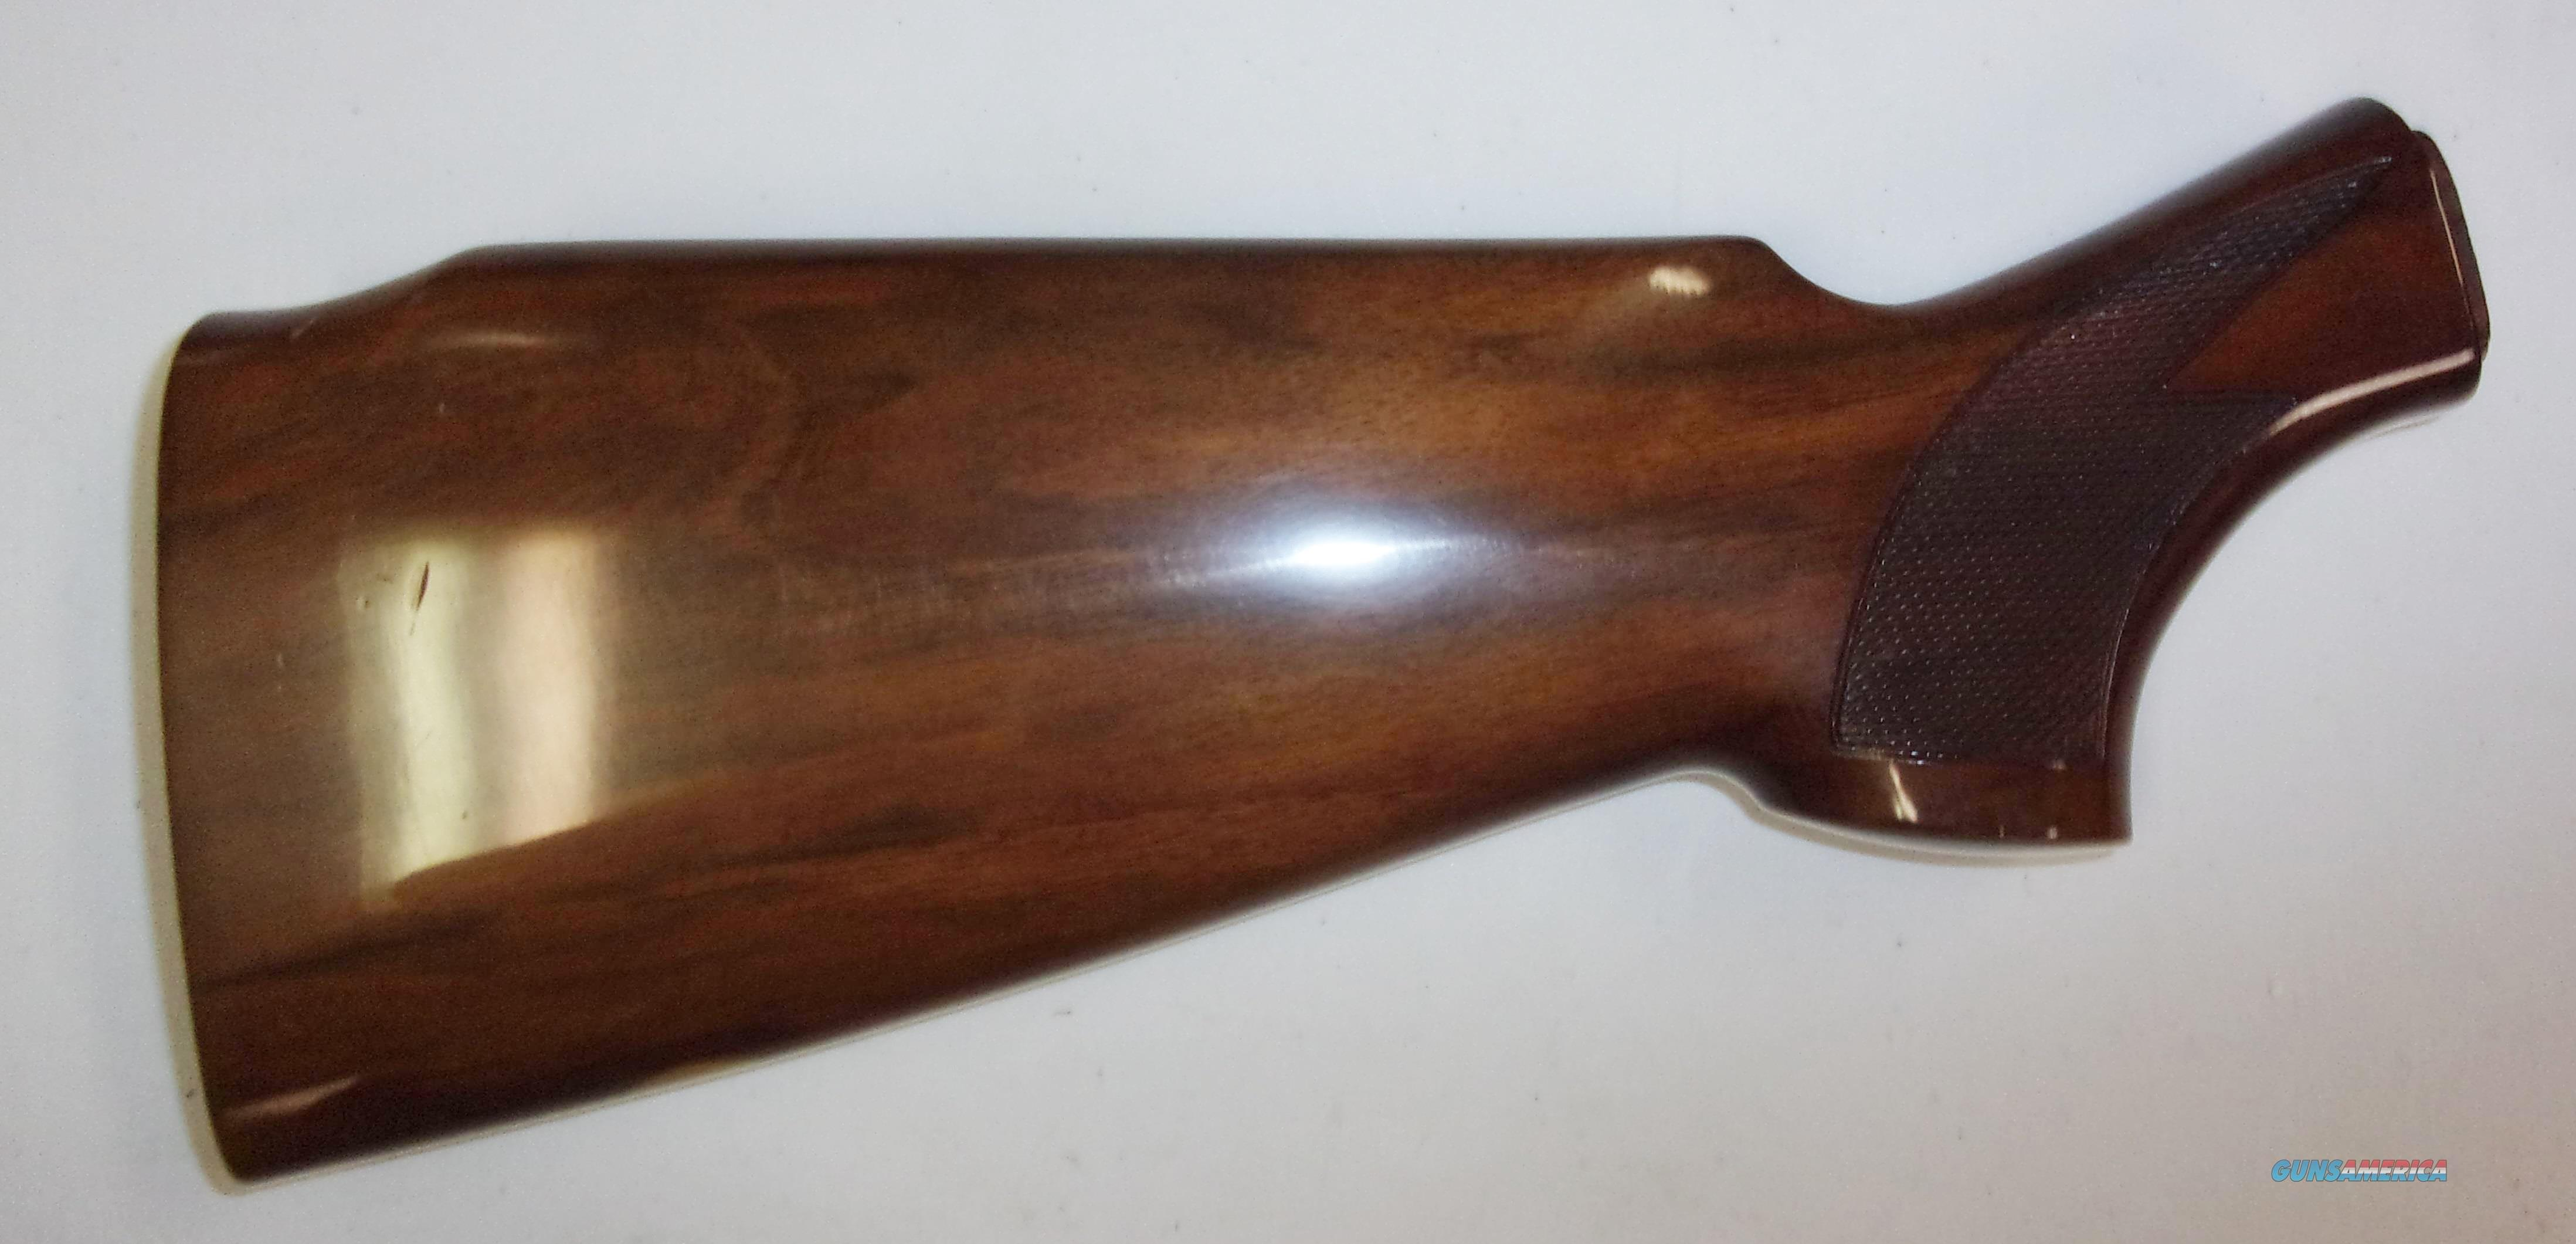 Miscellaneous Wood Stock  Non-Guns > Gunstocks, Grips & Wood